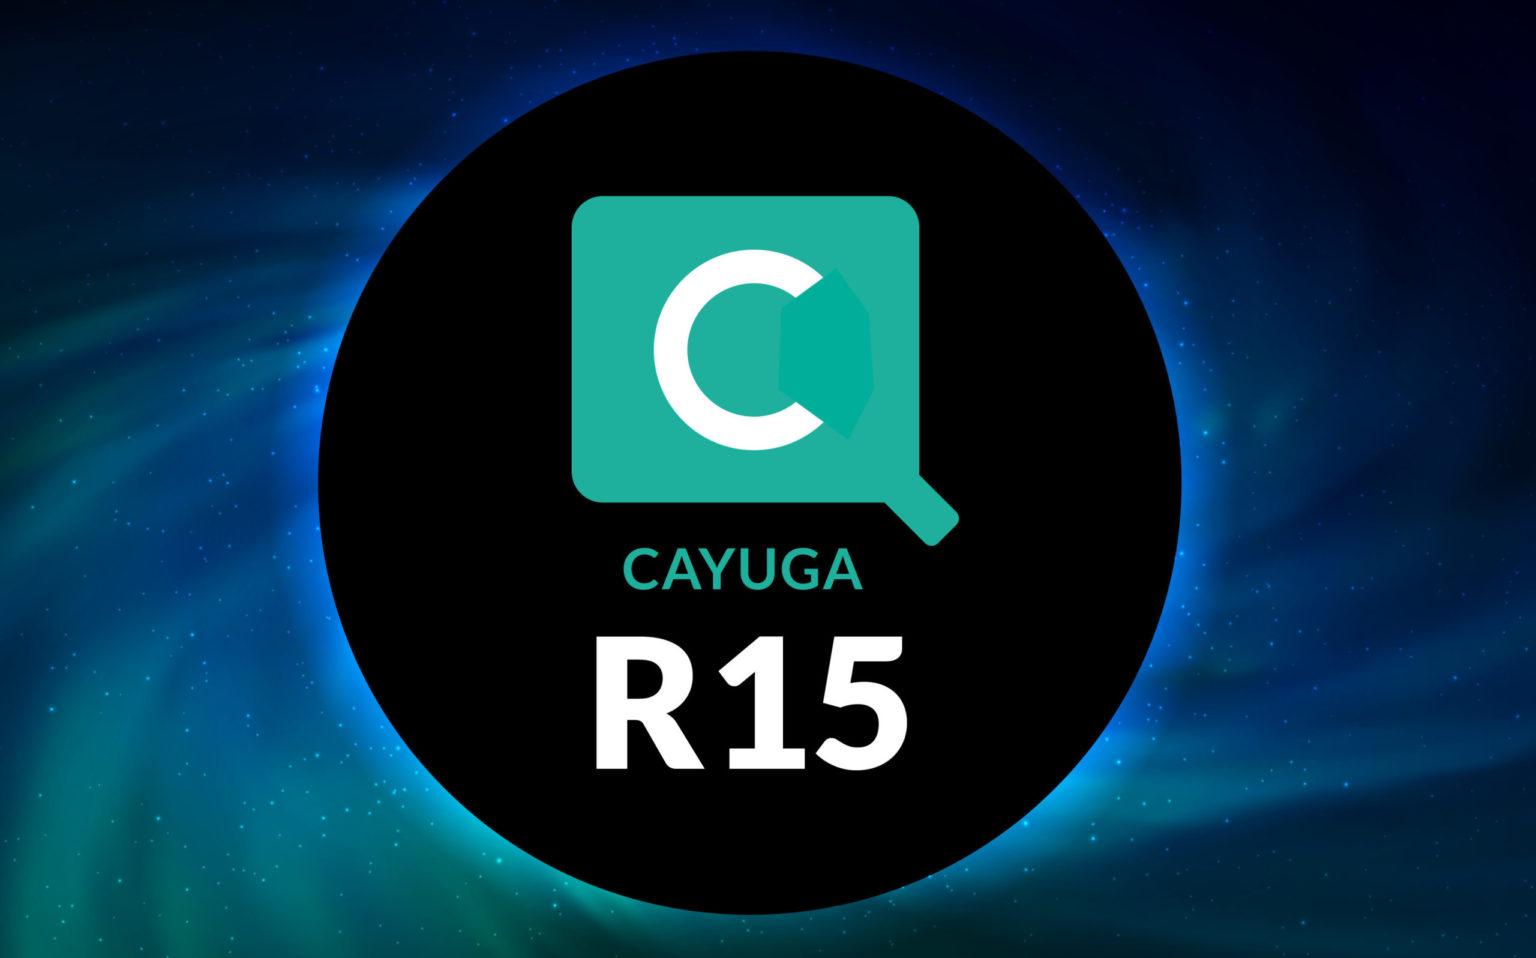 Cayuga R15